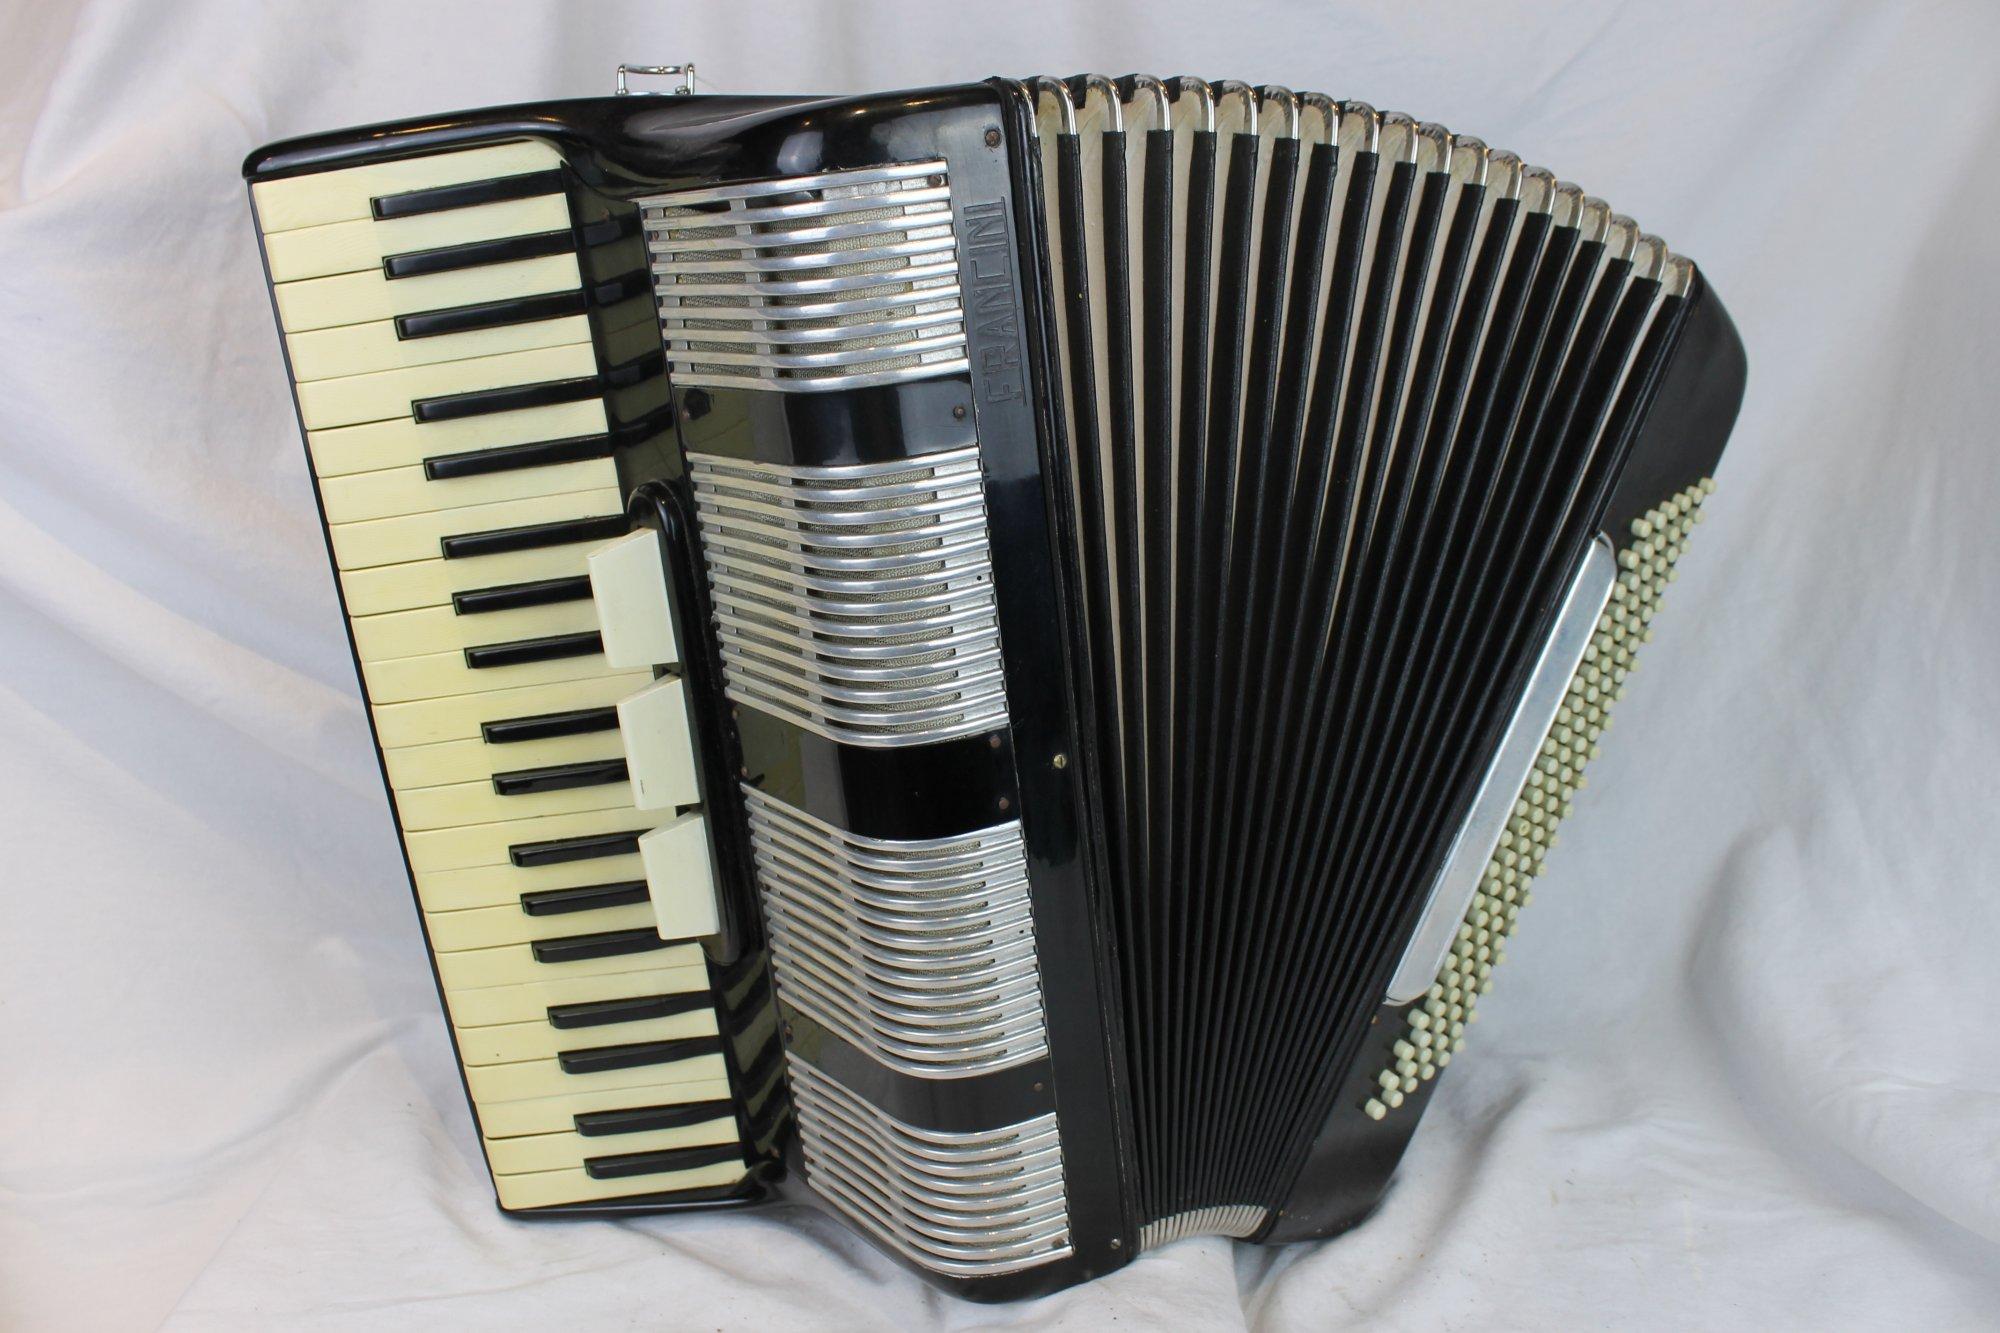 6133 - Black Francini Piano Accordion LMM 41 120